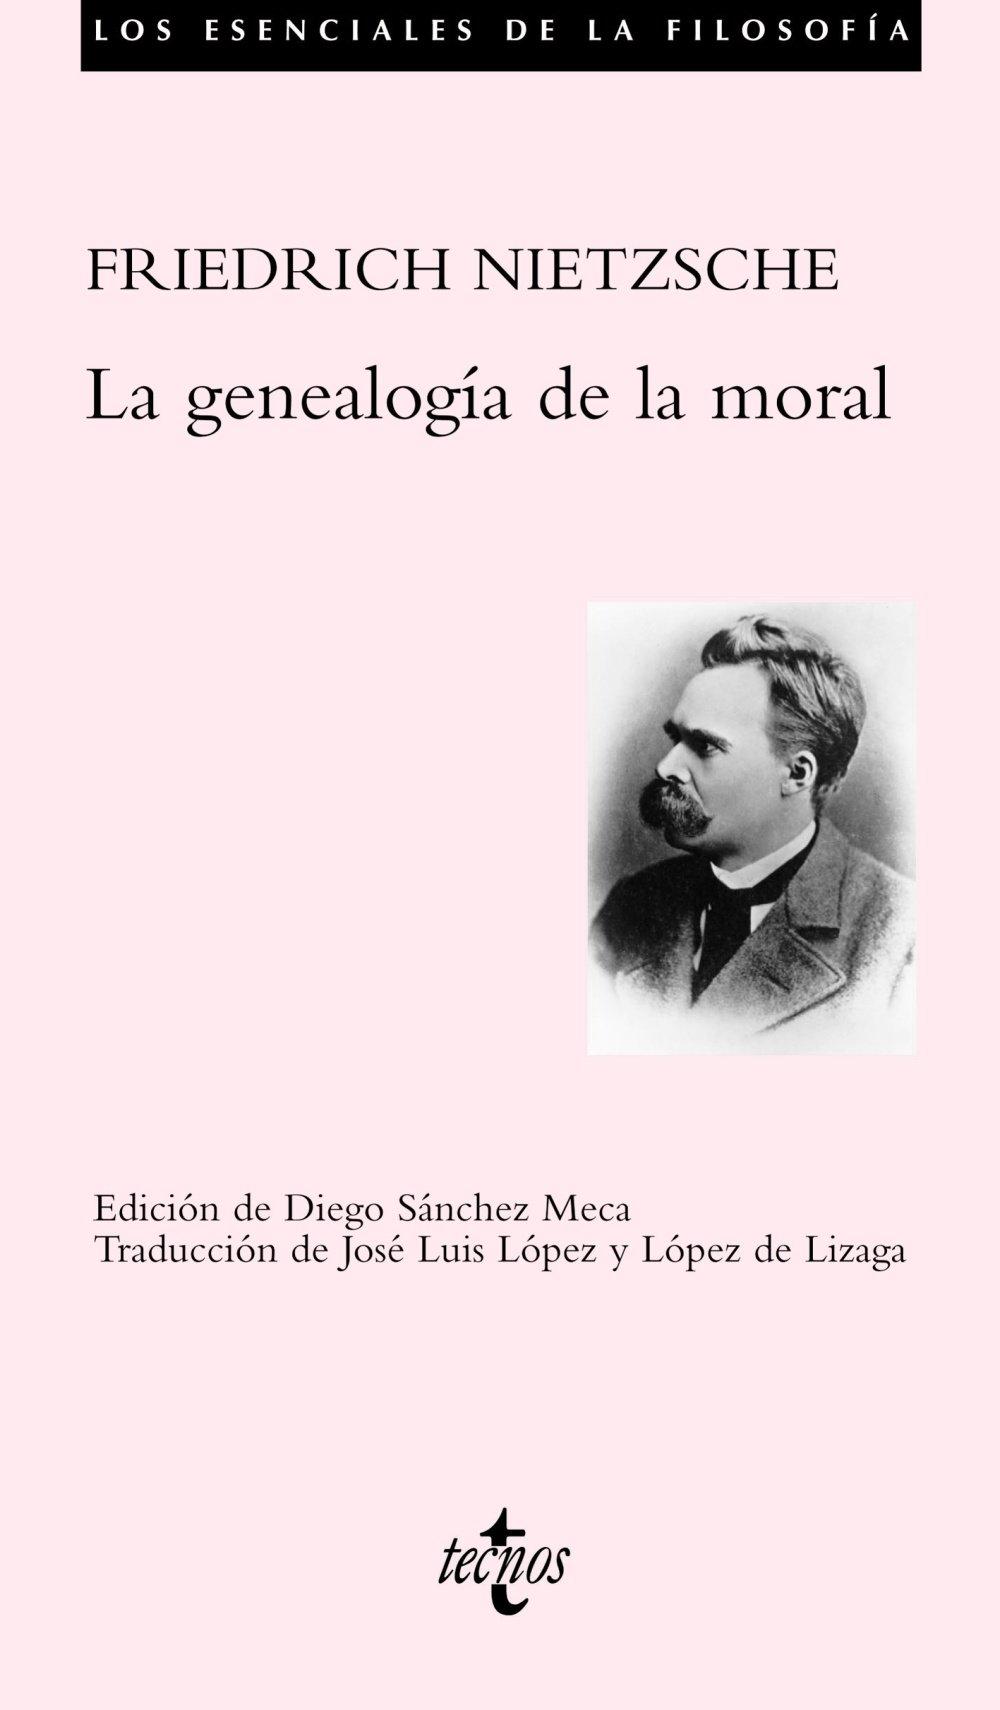 La Genealogia De La Moral / the Genealogy of Morals (Filosofia) (Spanish  Edition): Friedrich Wilhelm Nietzsche: 9788430939541: Amazon.com: Books